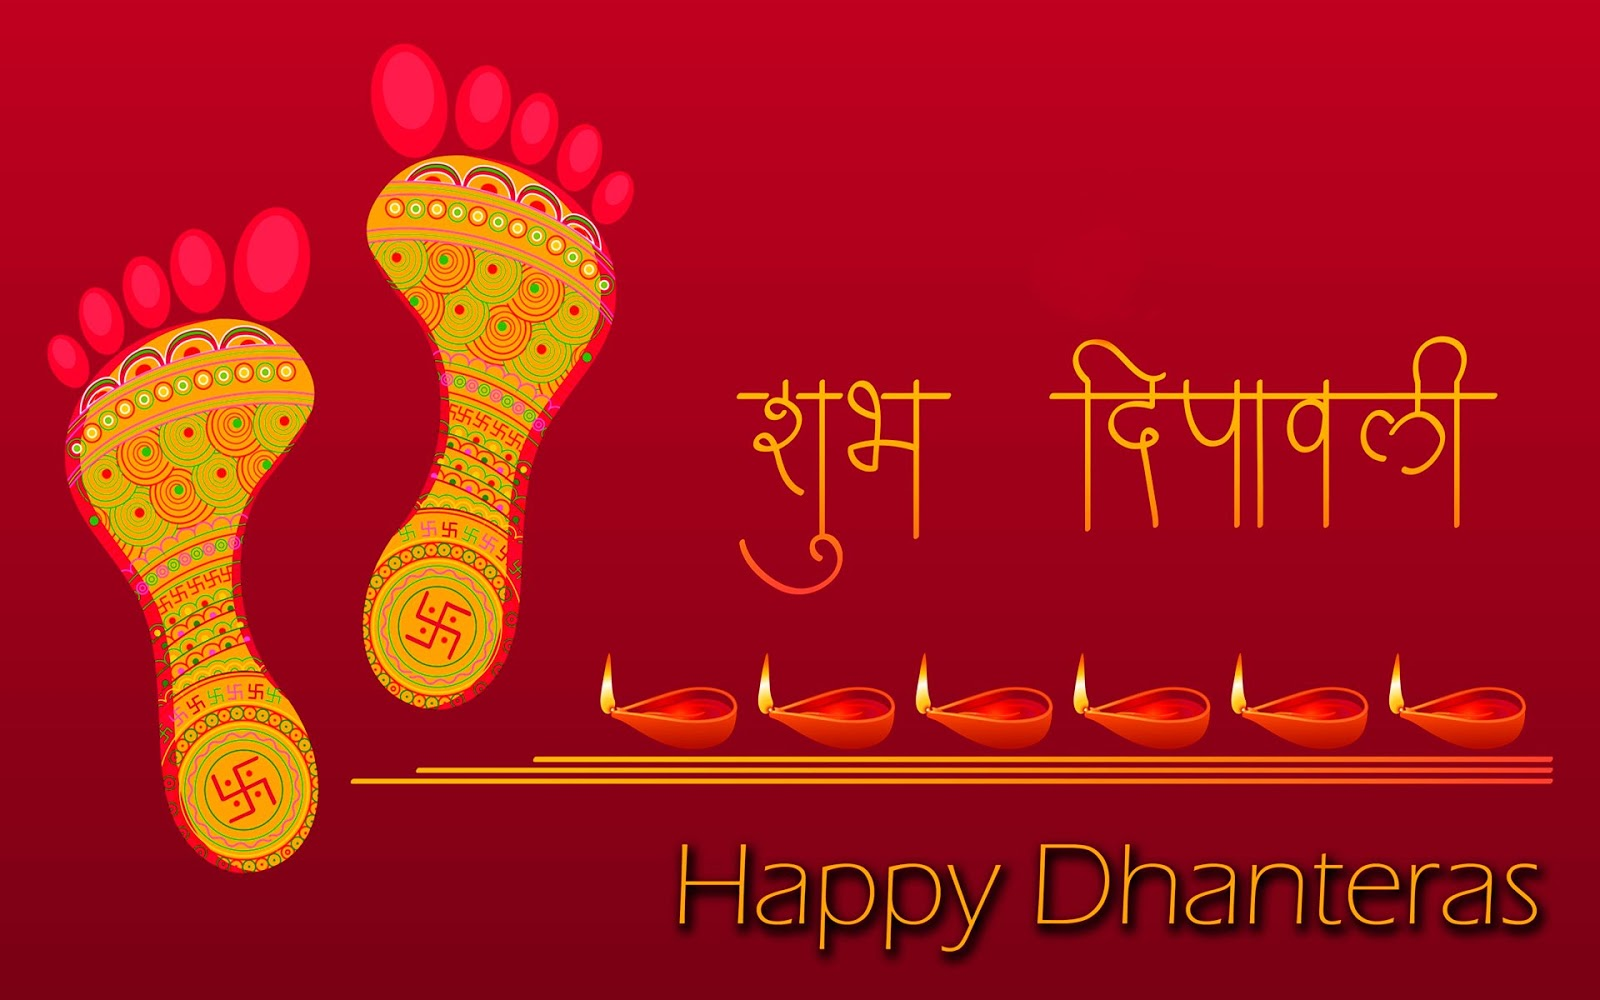 Diwali messages collection hindi diwali messages hindilatest diwali messagesdiwali messages in english diwali wishes m4hsunfo Choice Image